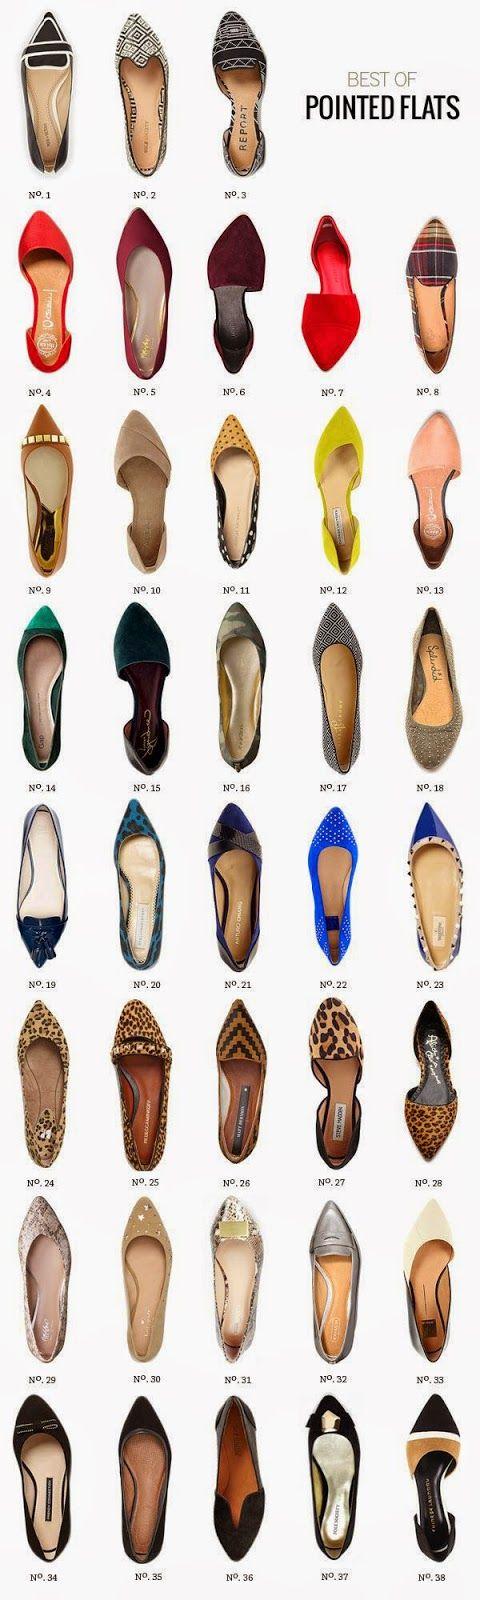 Põe o pé aê!: Mundo Manoletina